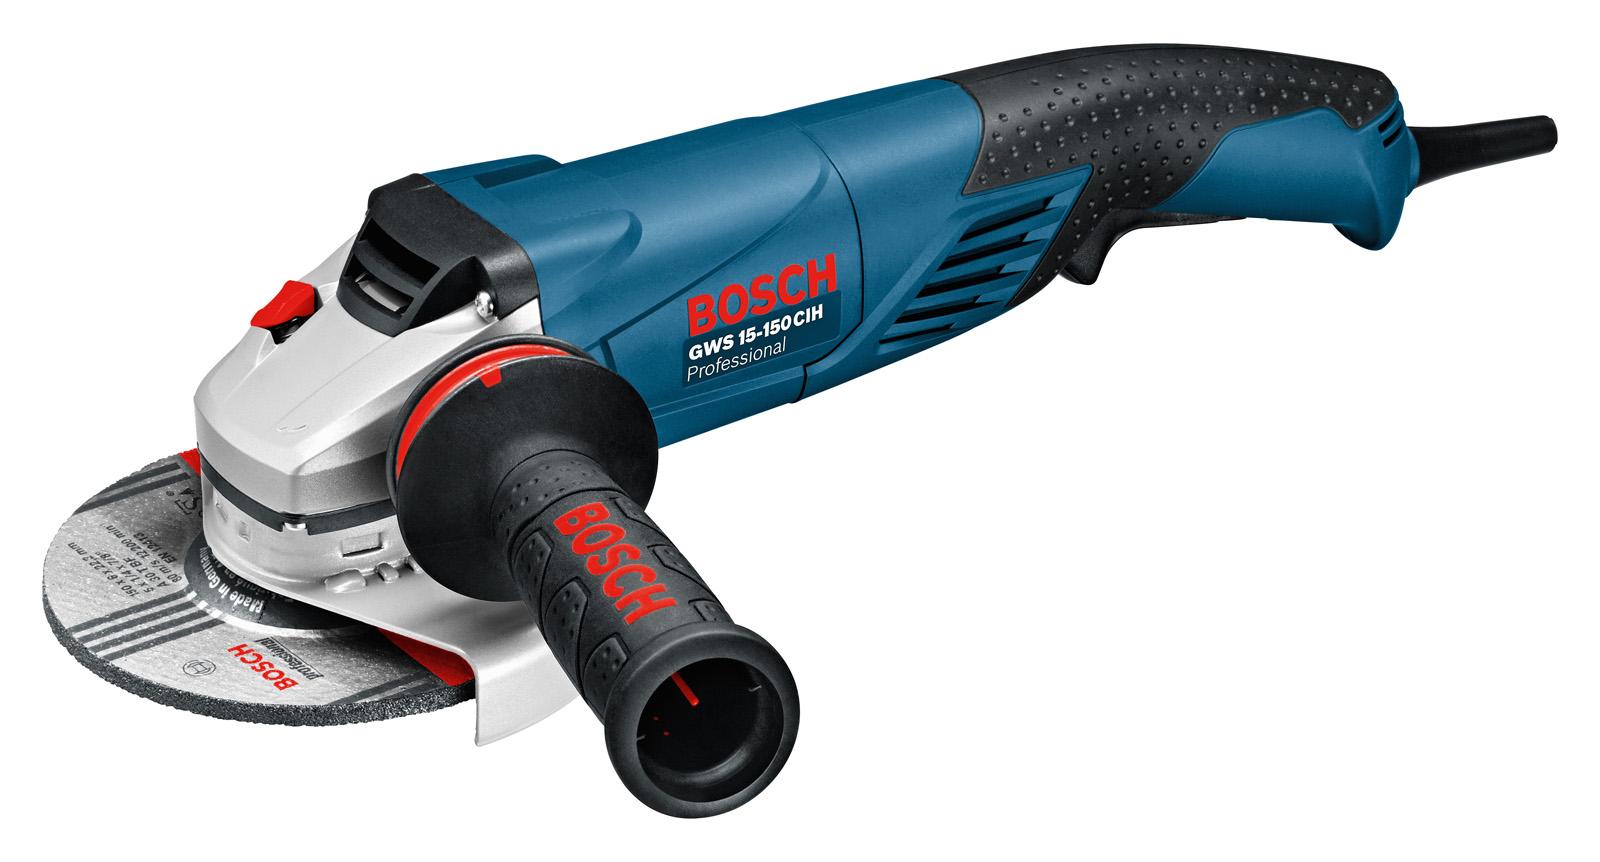 УШМ (болгарка) Bosch Gws 15-150 cih (0.601.830.522)